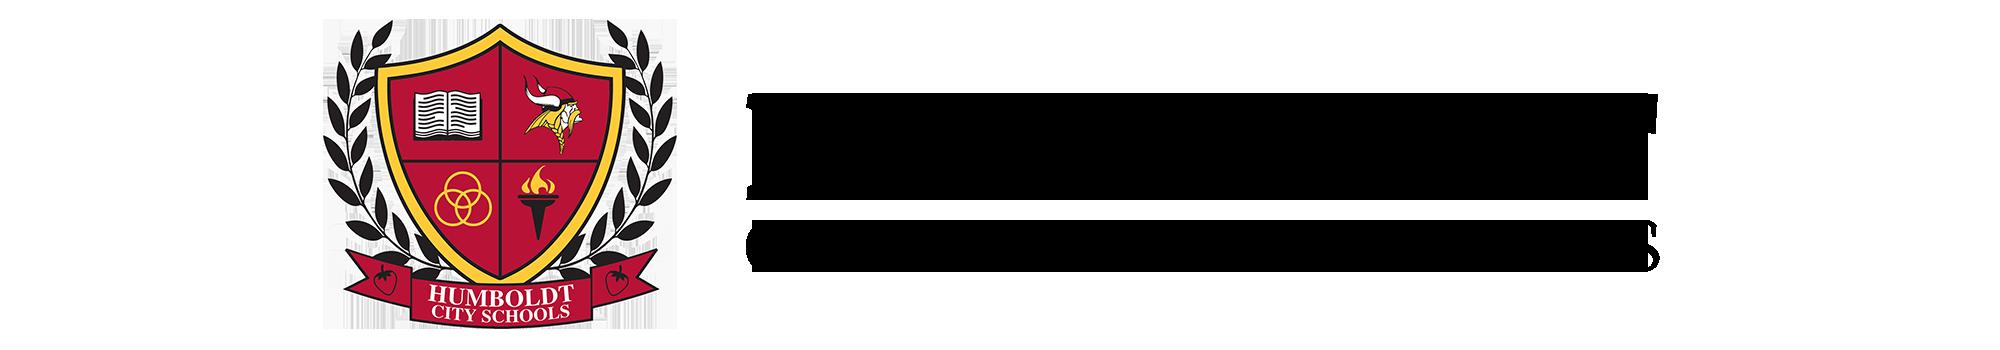 Humboldt City Schools Logo